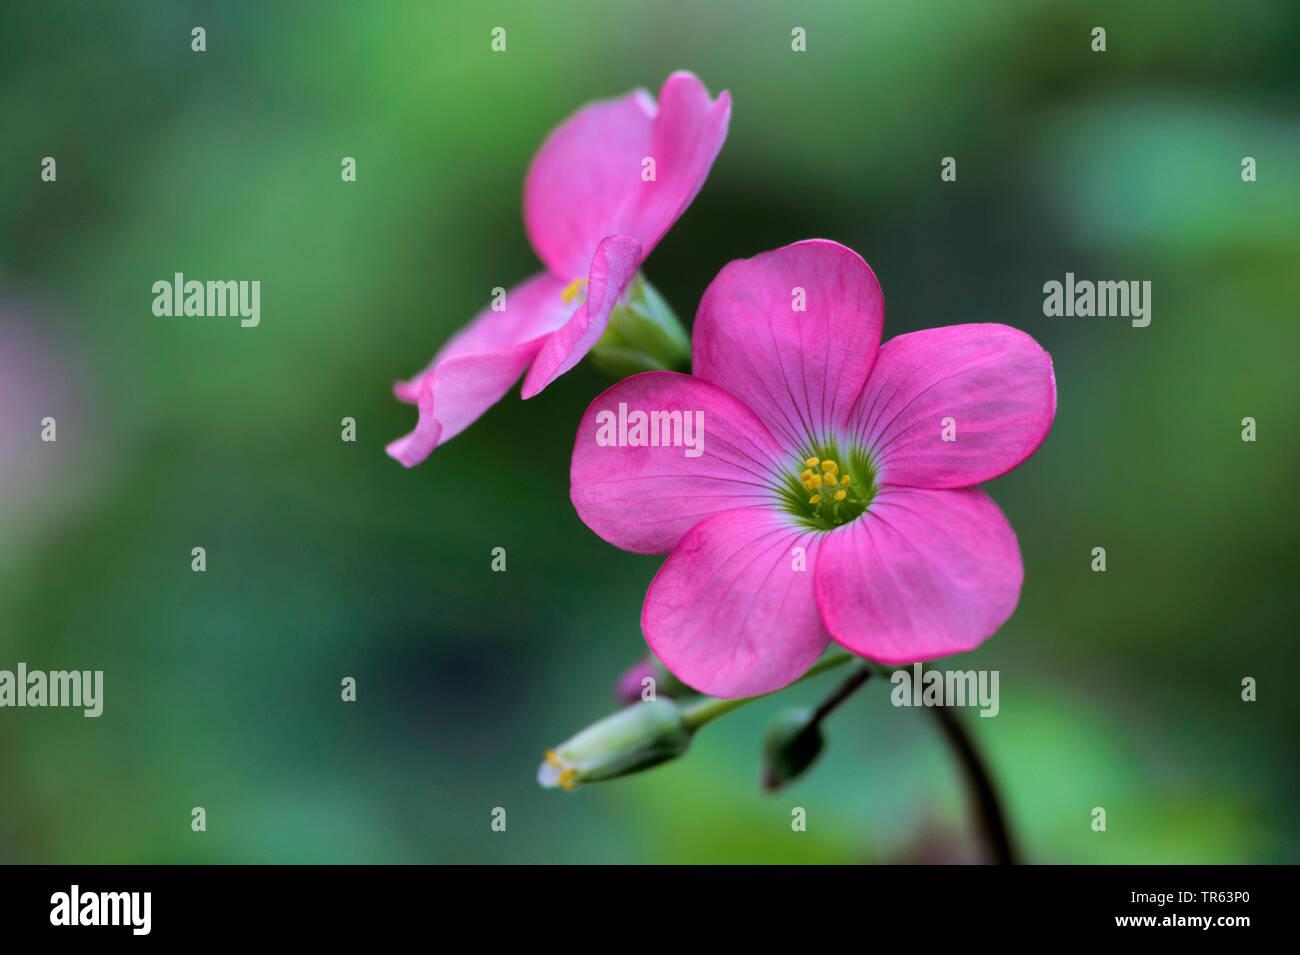 four-leafed clover (Oxalis tetraphylla 'Iron Cross', Oxalis tetraphylla Iron Cross, Oxalis deppei), flowers of cultivar Iron Cross Stock Photo